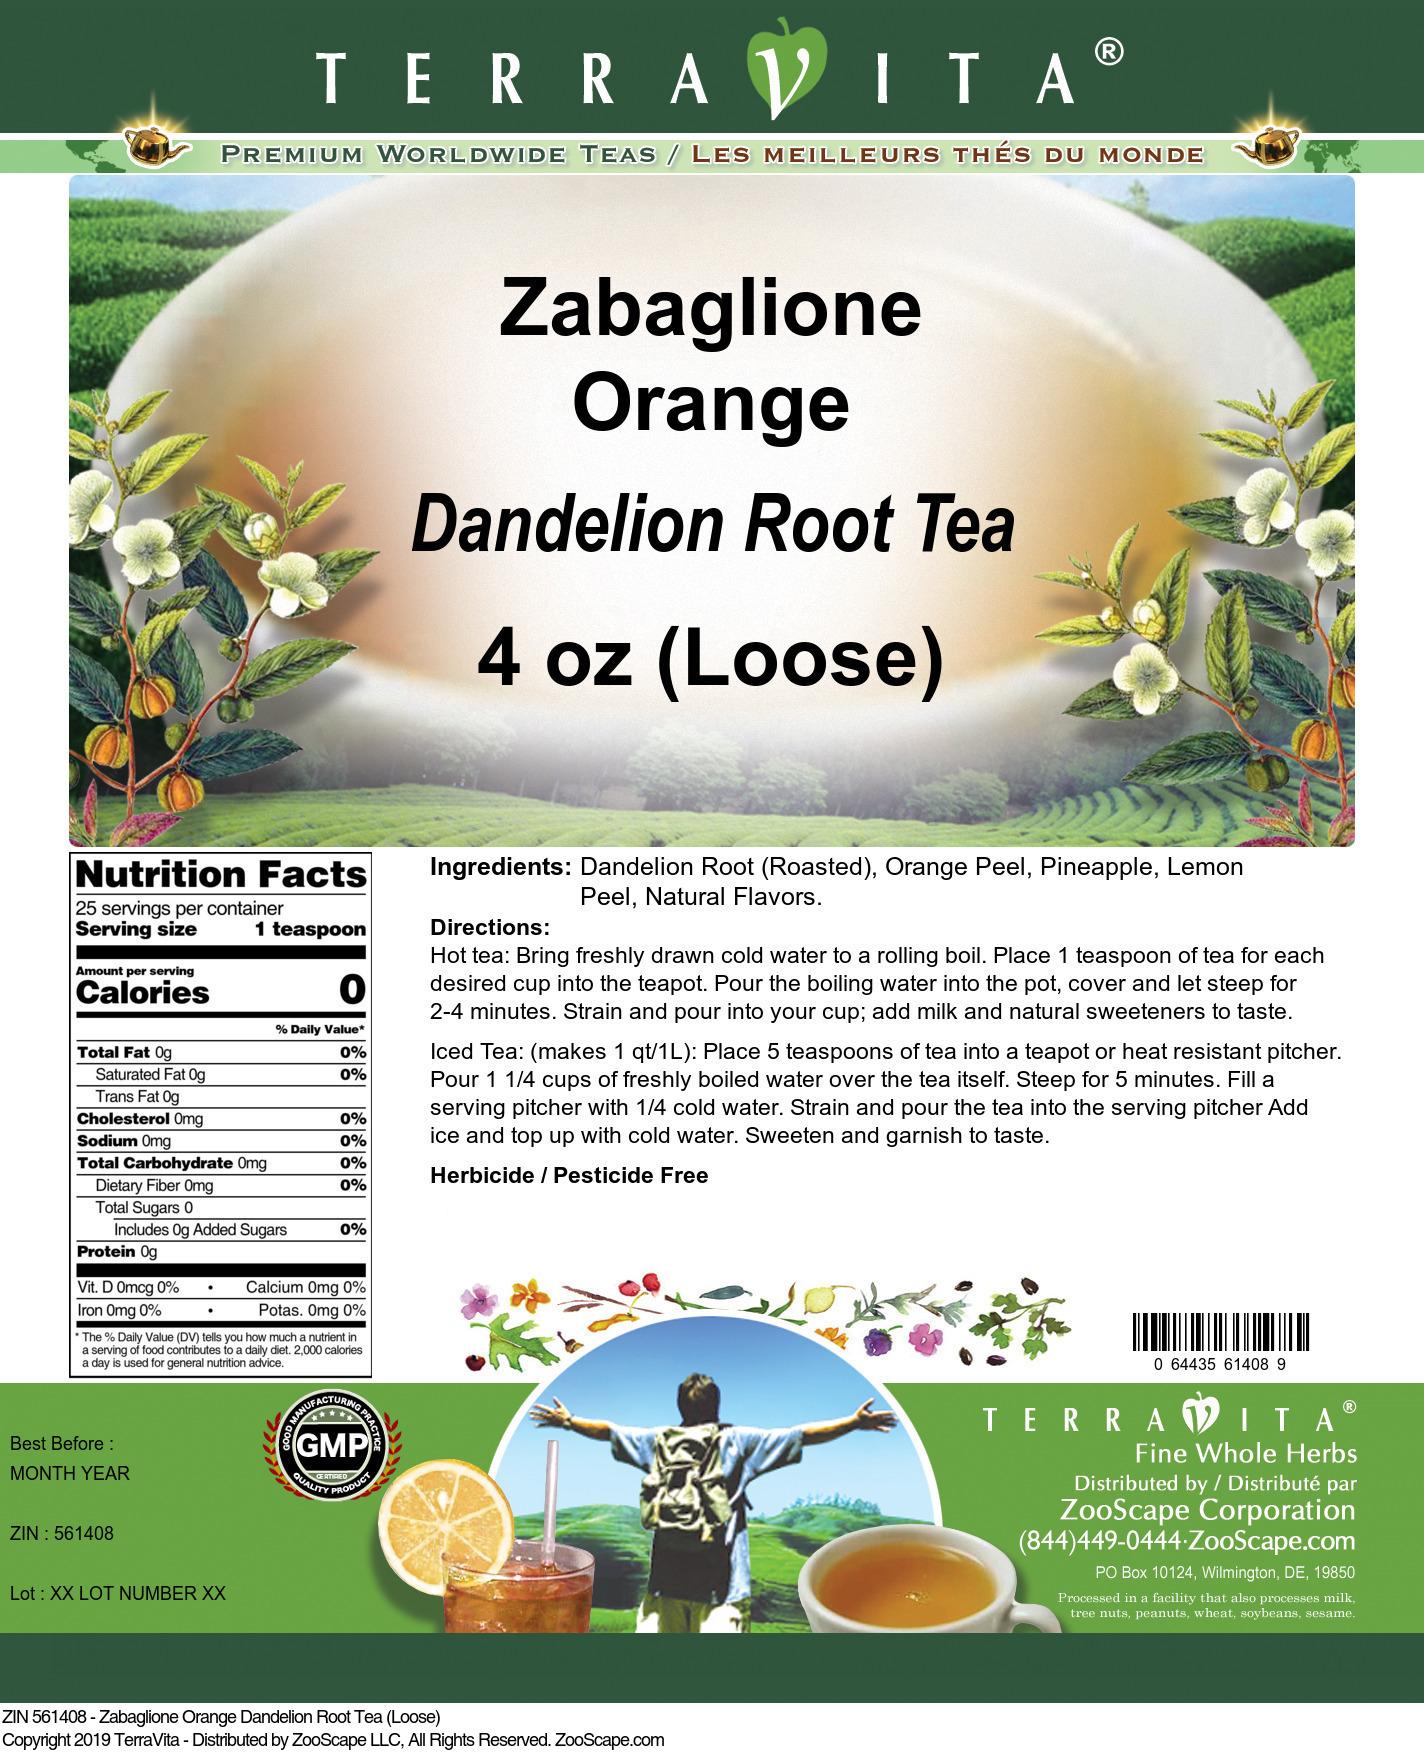 Zabaglione Orange Dandelion Root